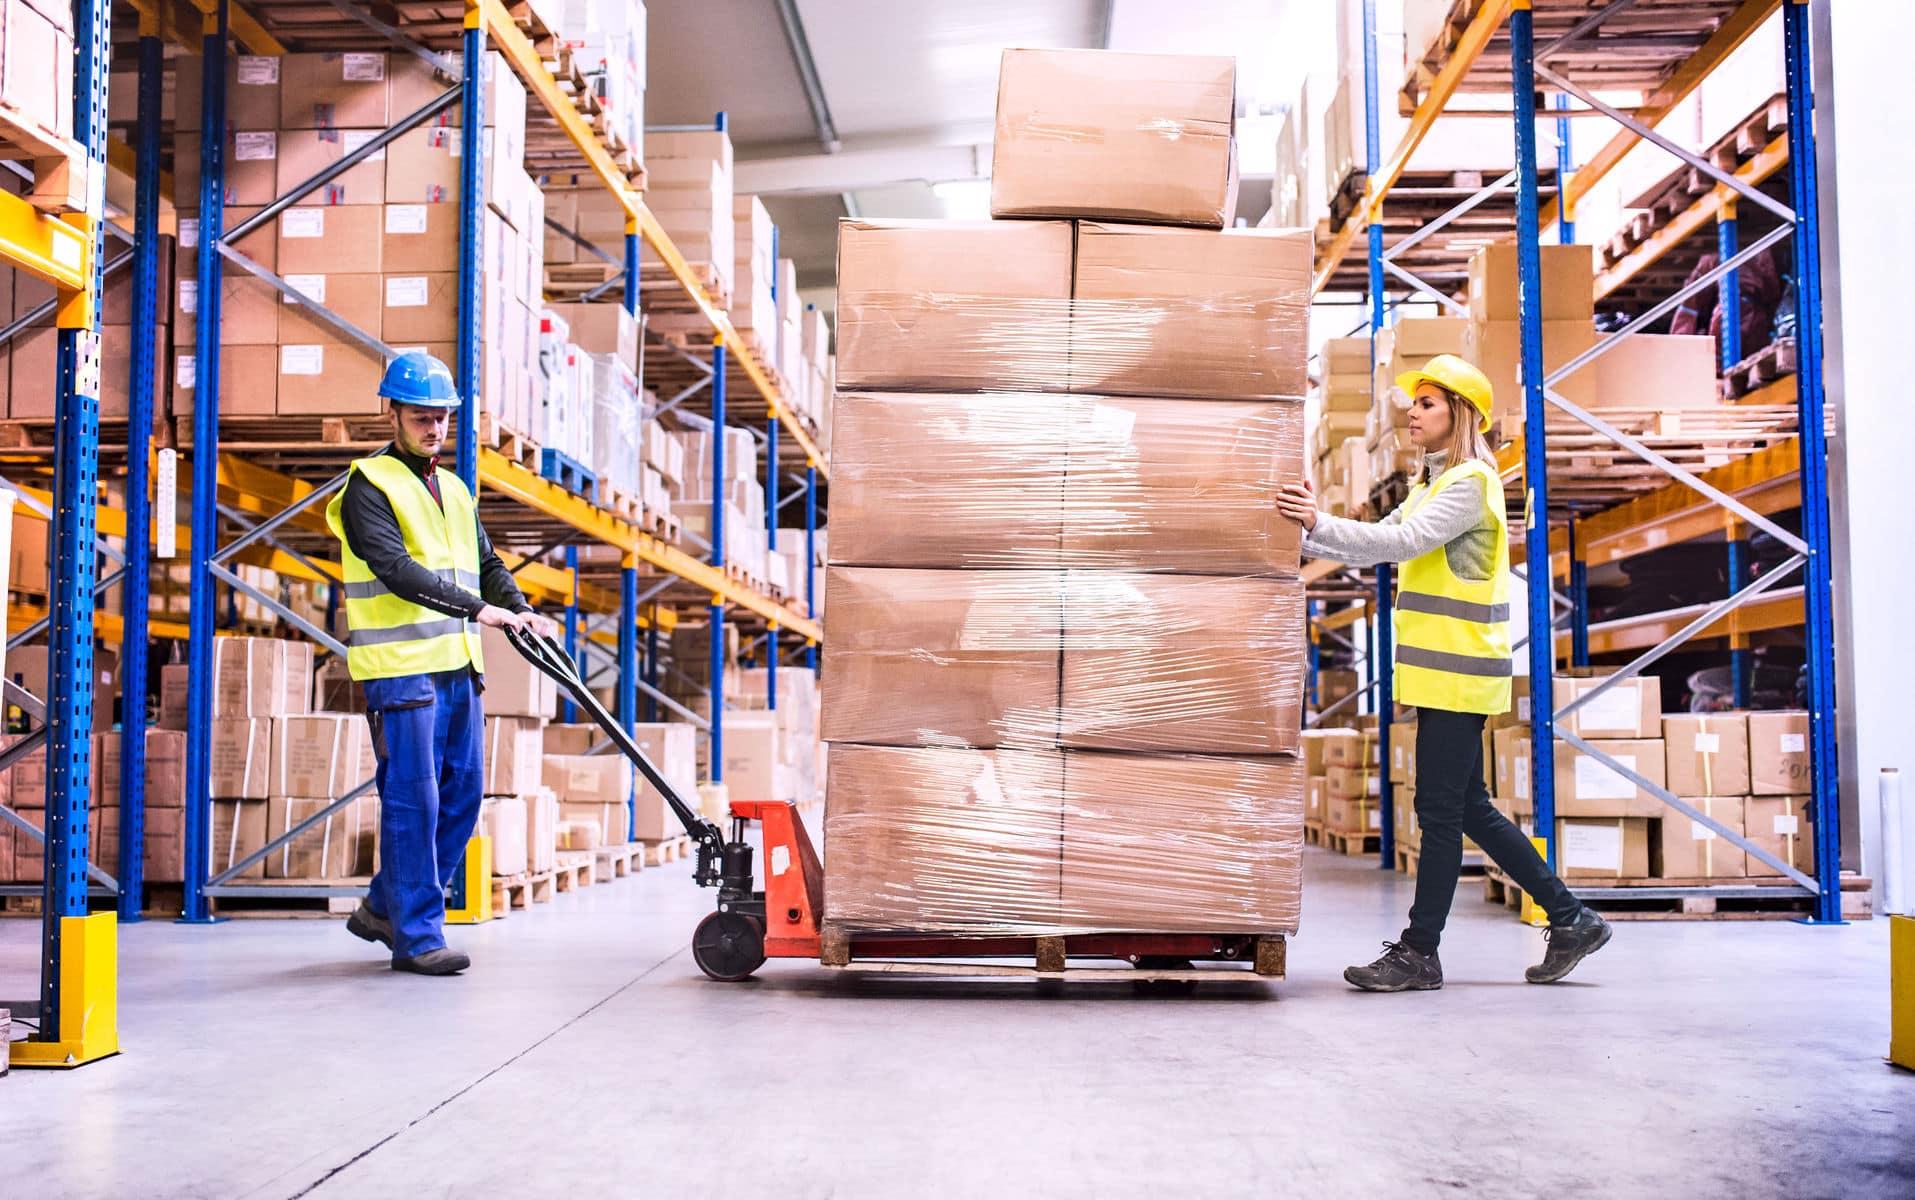 moving warehouse equipment manual lift